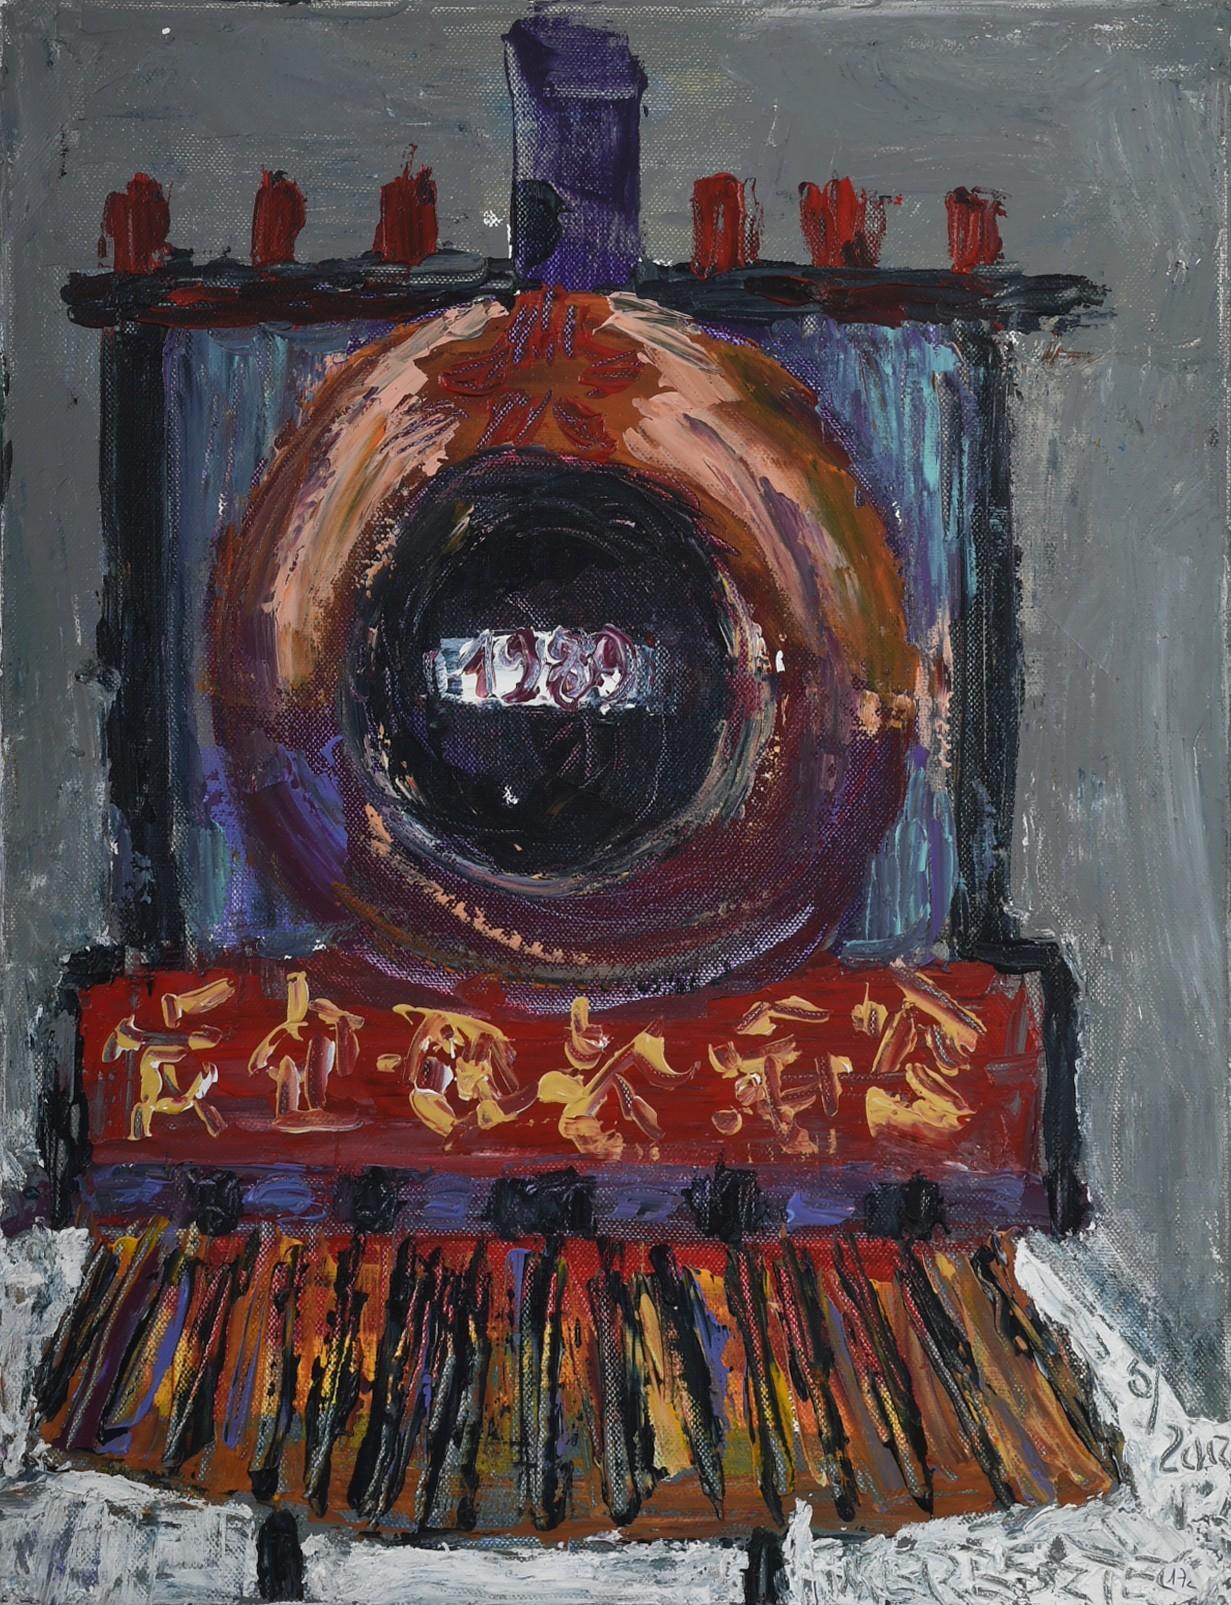 toile 07 07 18 3133 - magdalena keresztes, artiste peintre à amiens